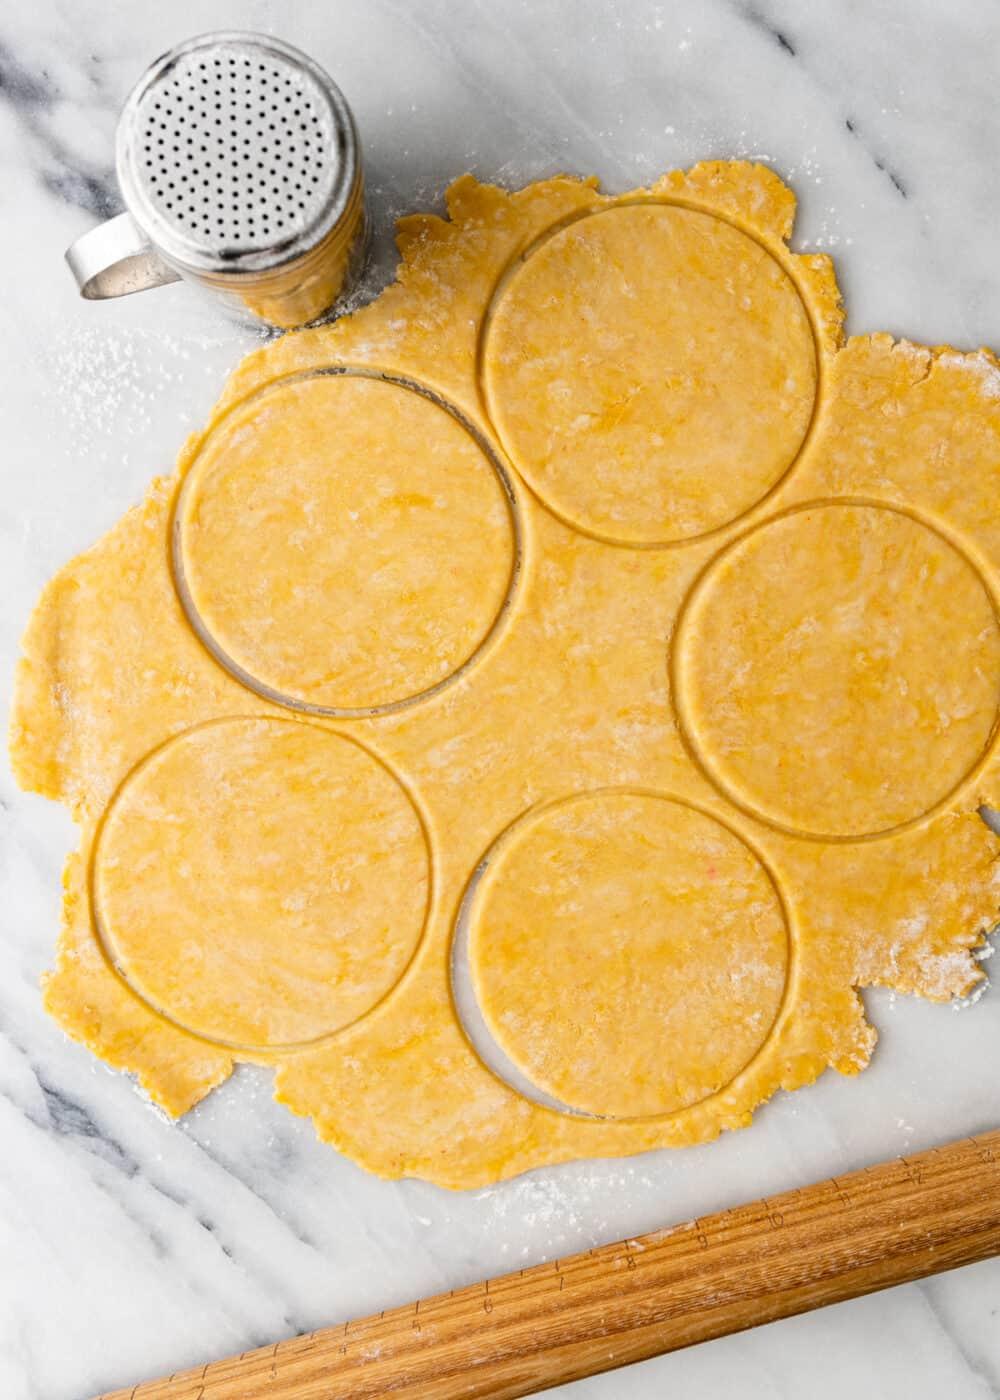 overhead: cutting empanada discs from dough